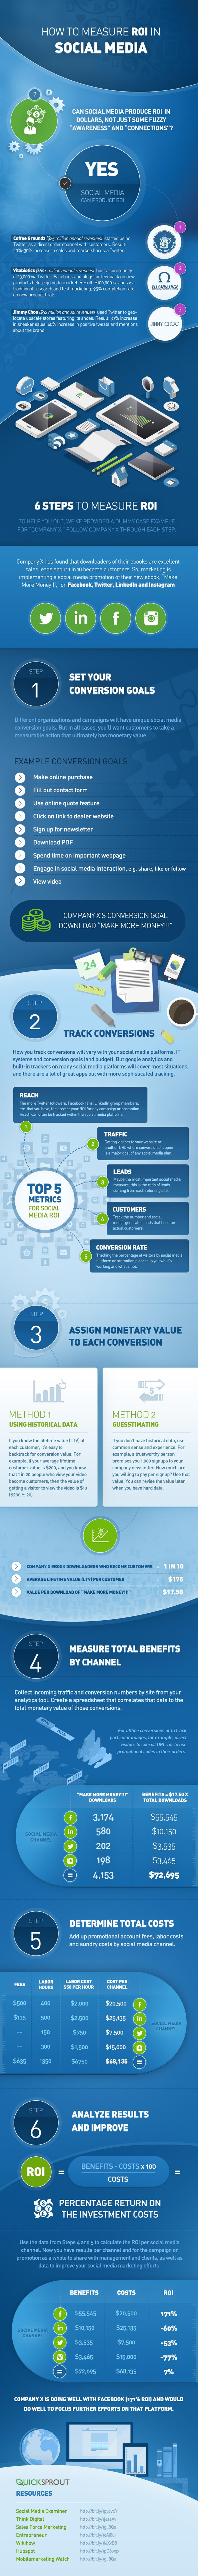 Measuring-Social-Media-ROI